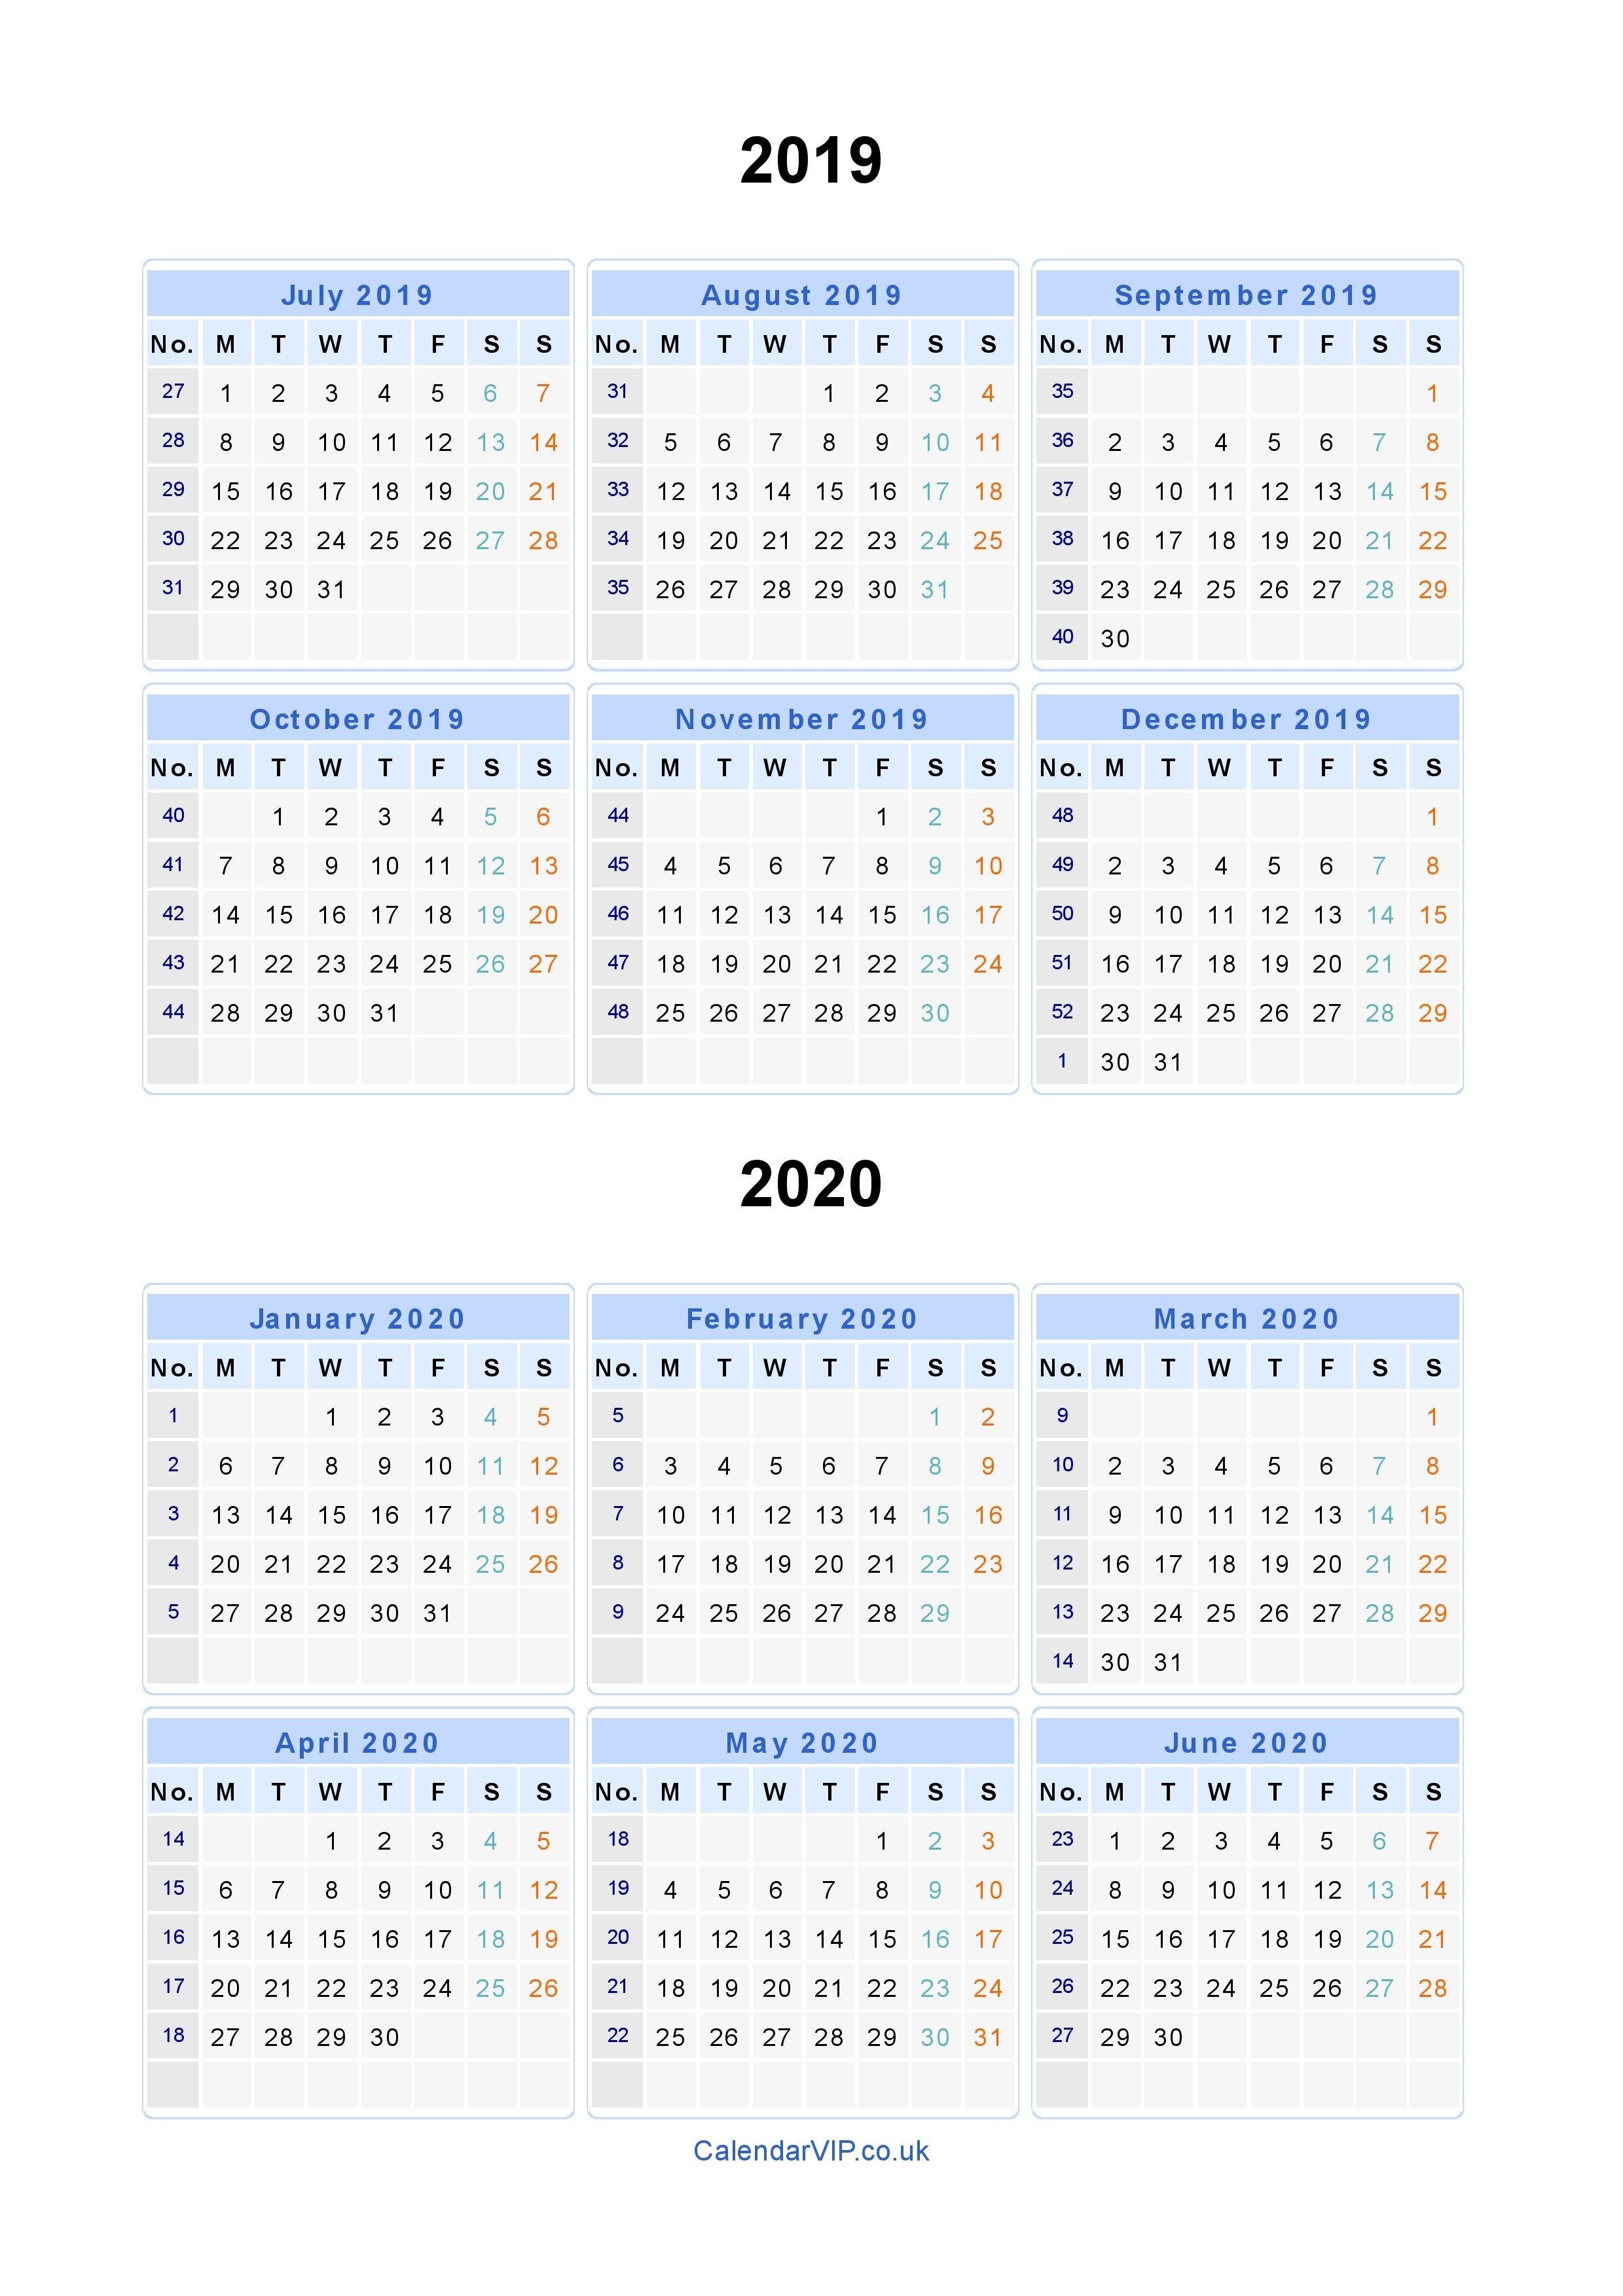 Split Year Calendars 2019 2020 - Calendar From July 2019 To June 2020 Calendar 2019 And 2020